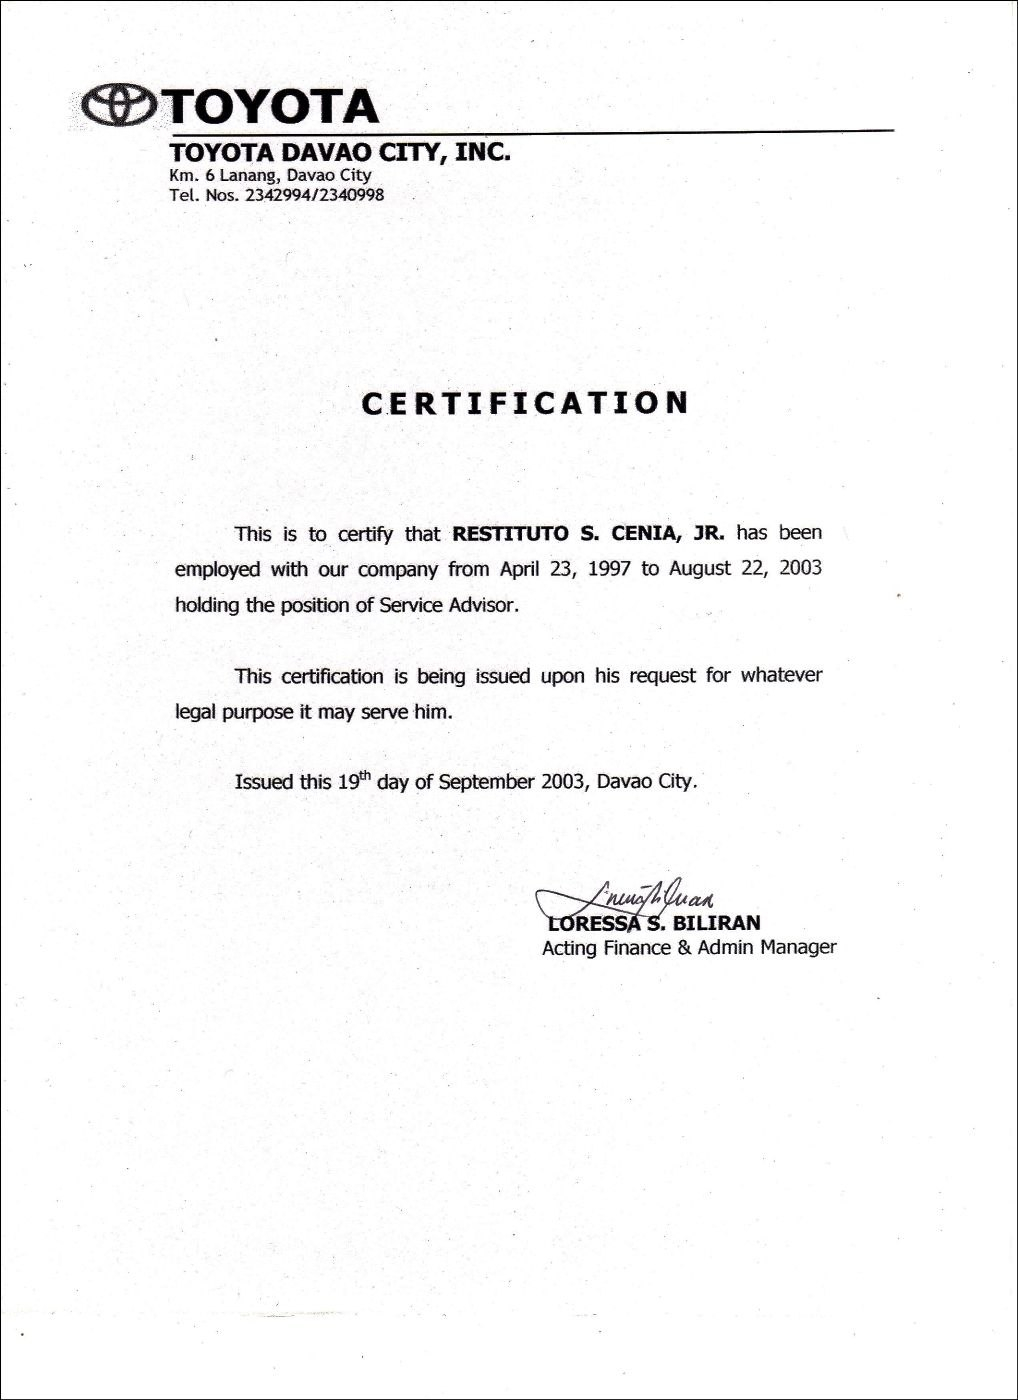 Employment Certificate Sample Best Templates Pinterest Marriage Regarding Employee Certificate Of Service Template